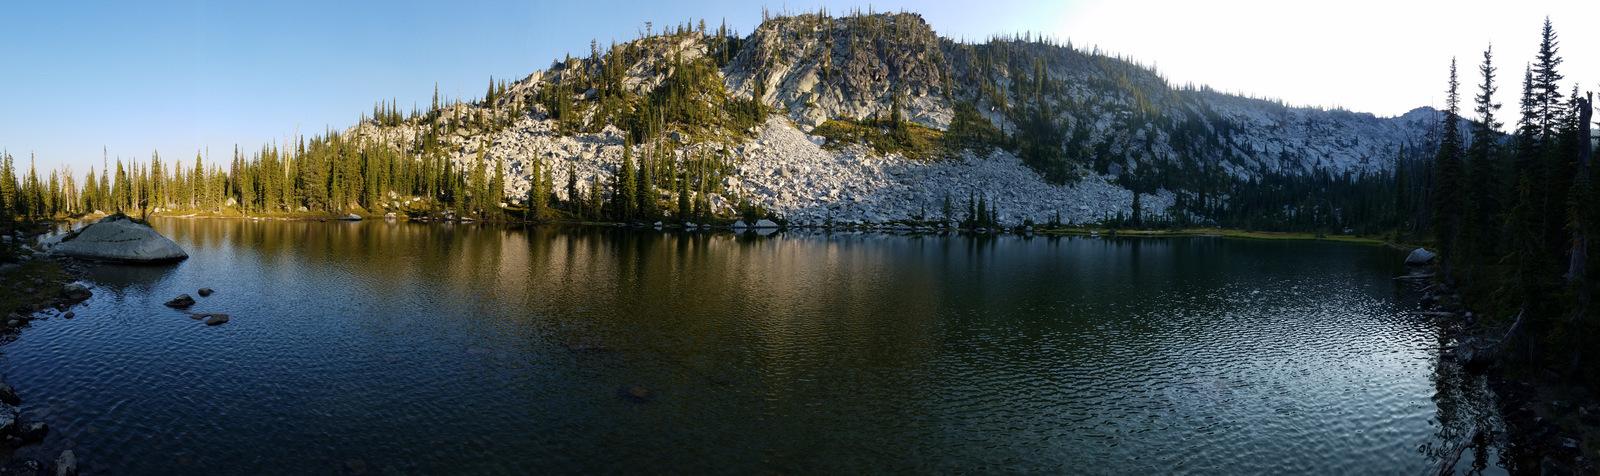 Swamp Lake